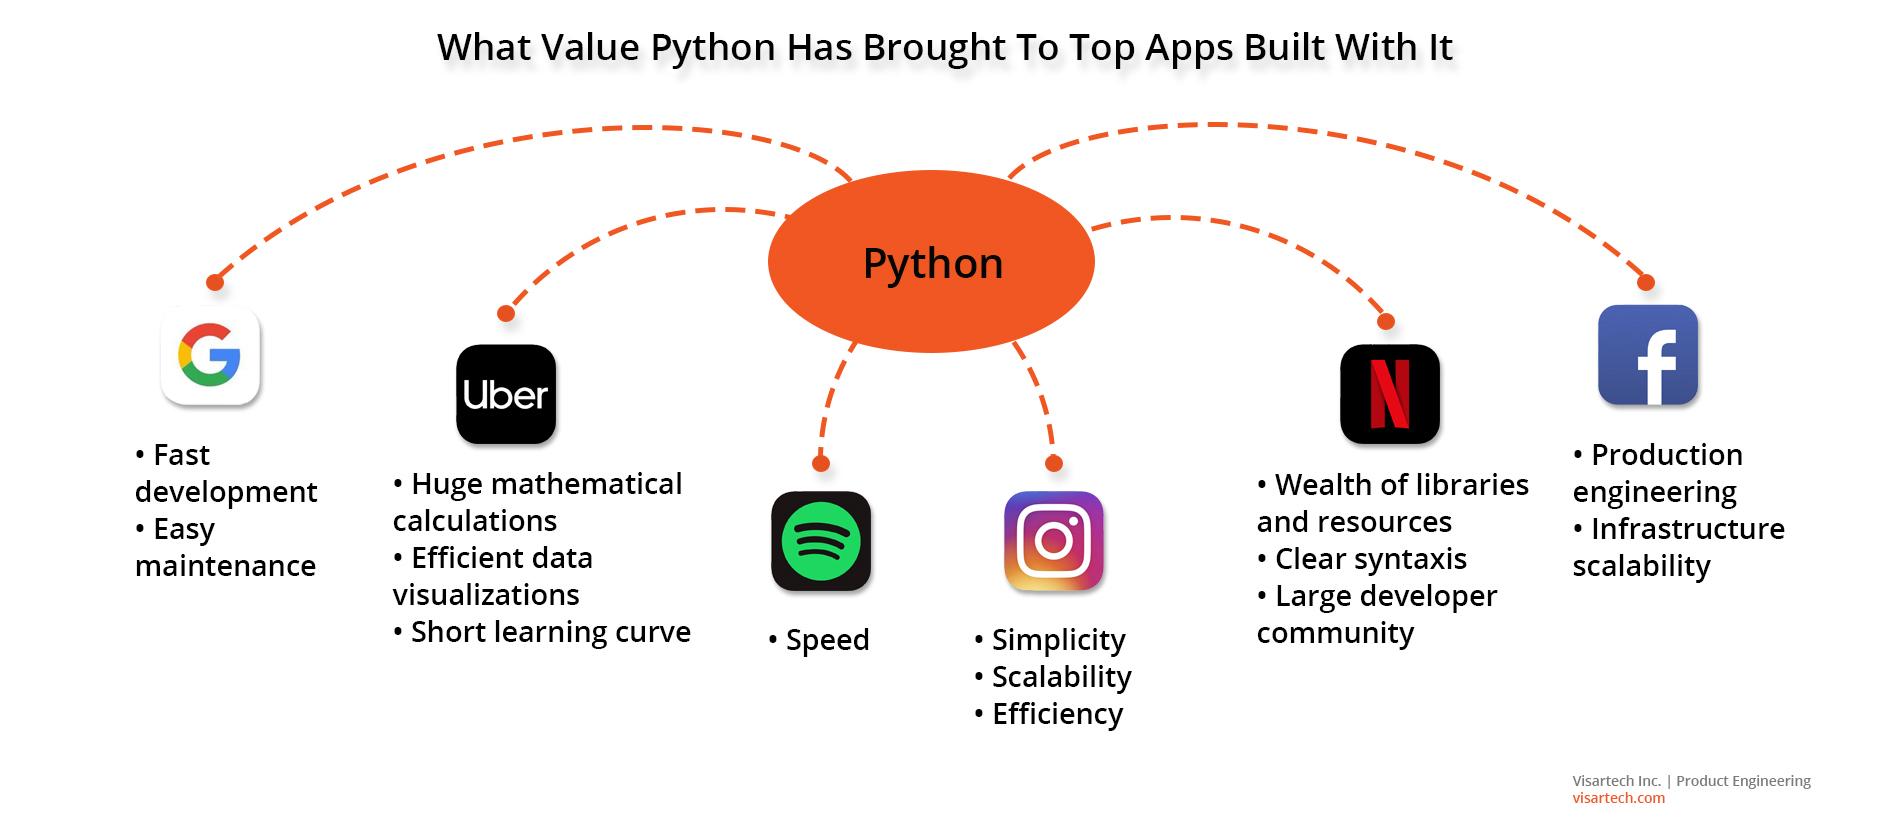 Top apps use Python - Visartech Blog